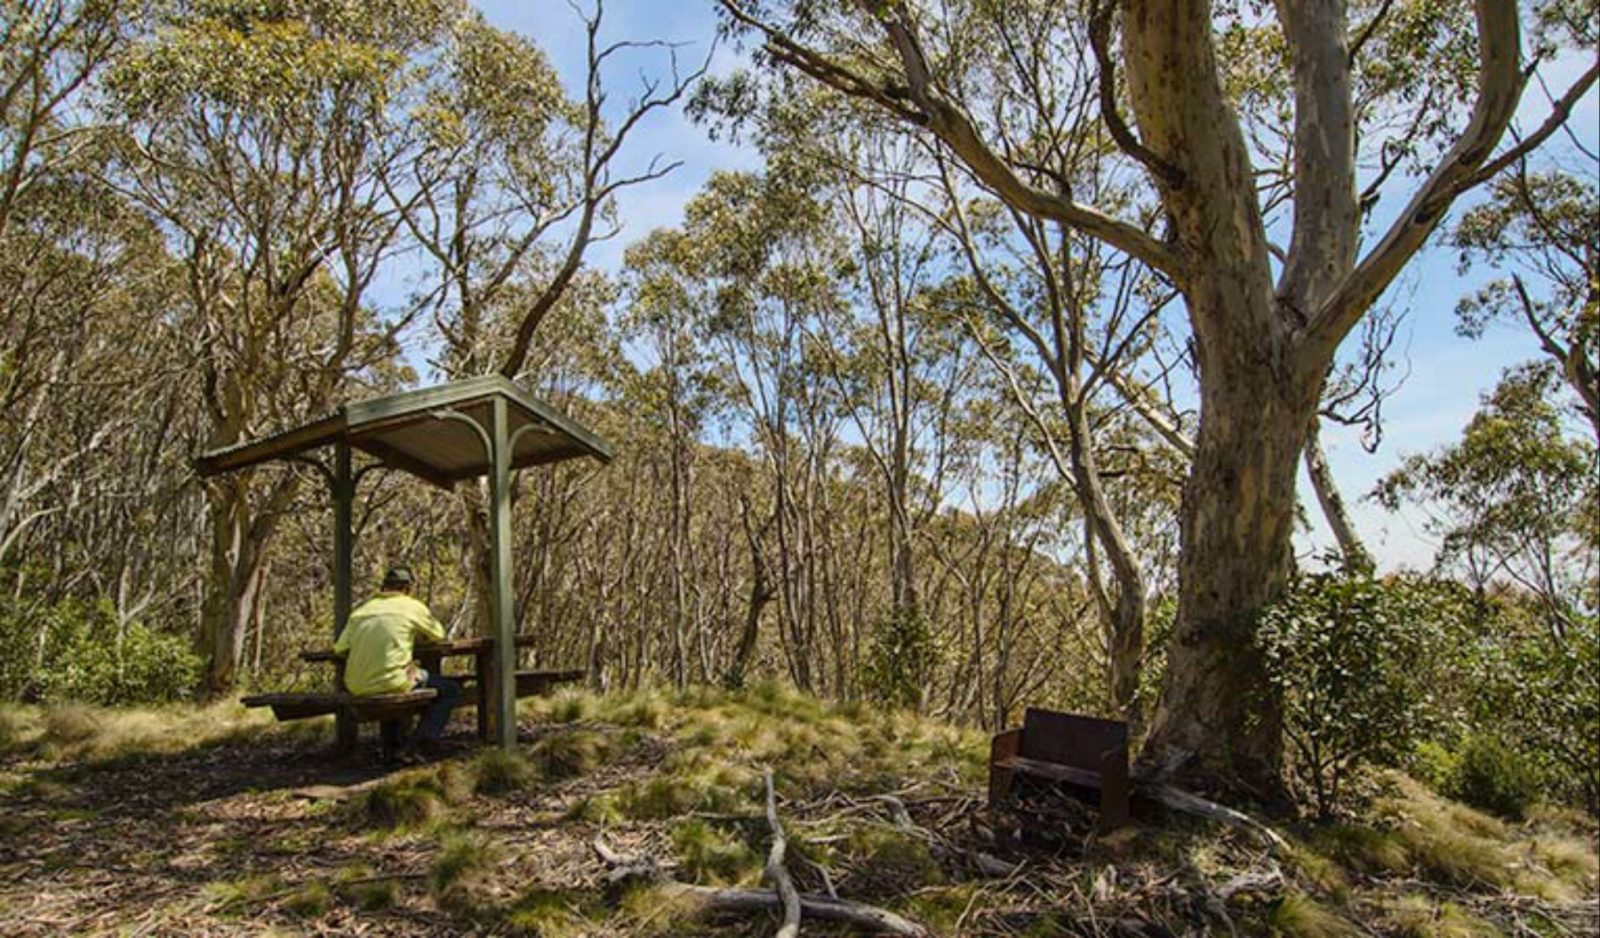 Mount Barrington picnic area